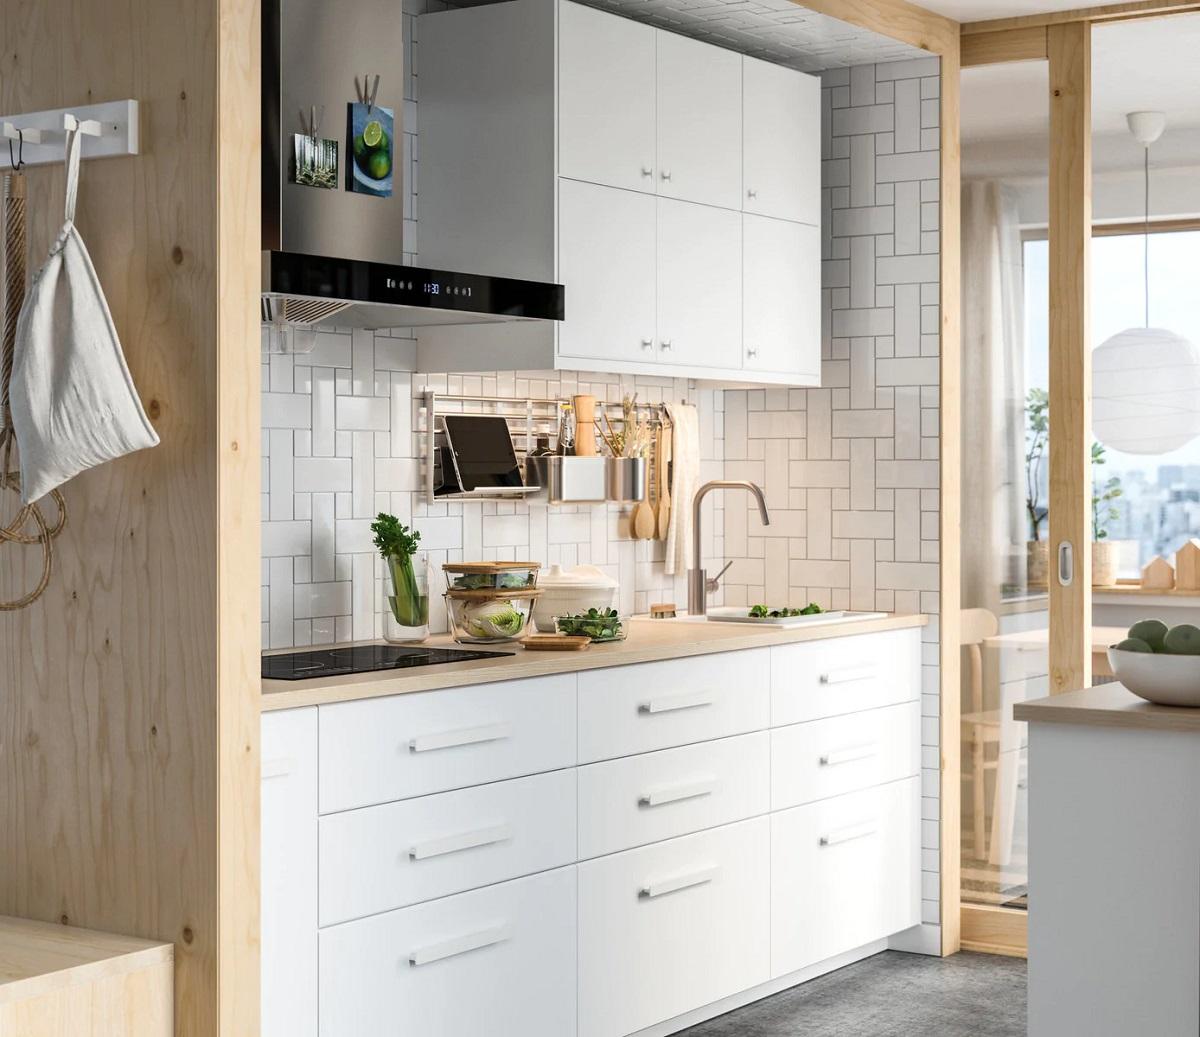 nuovo-catalogo-cucine-ikea-2020-15